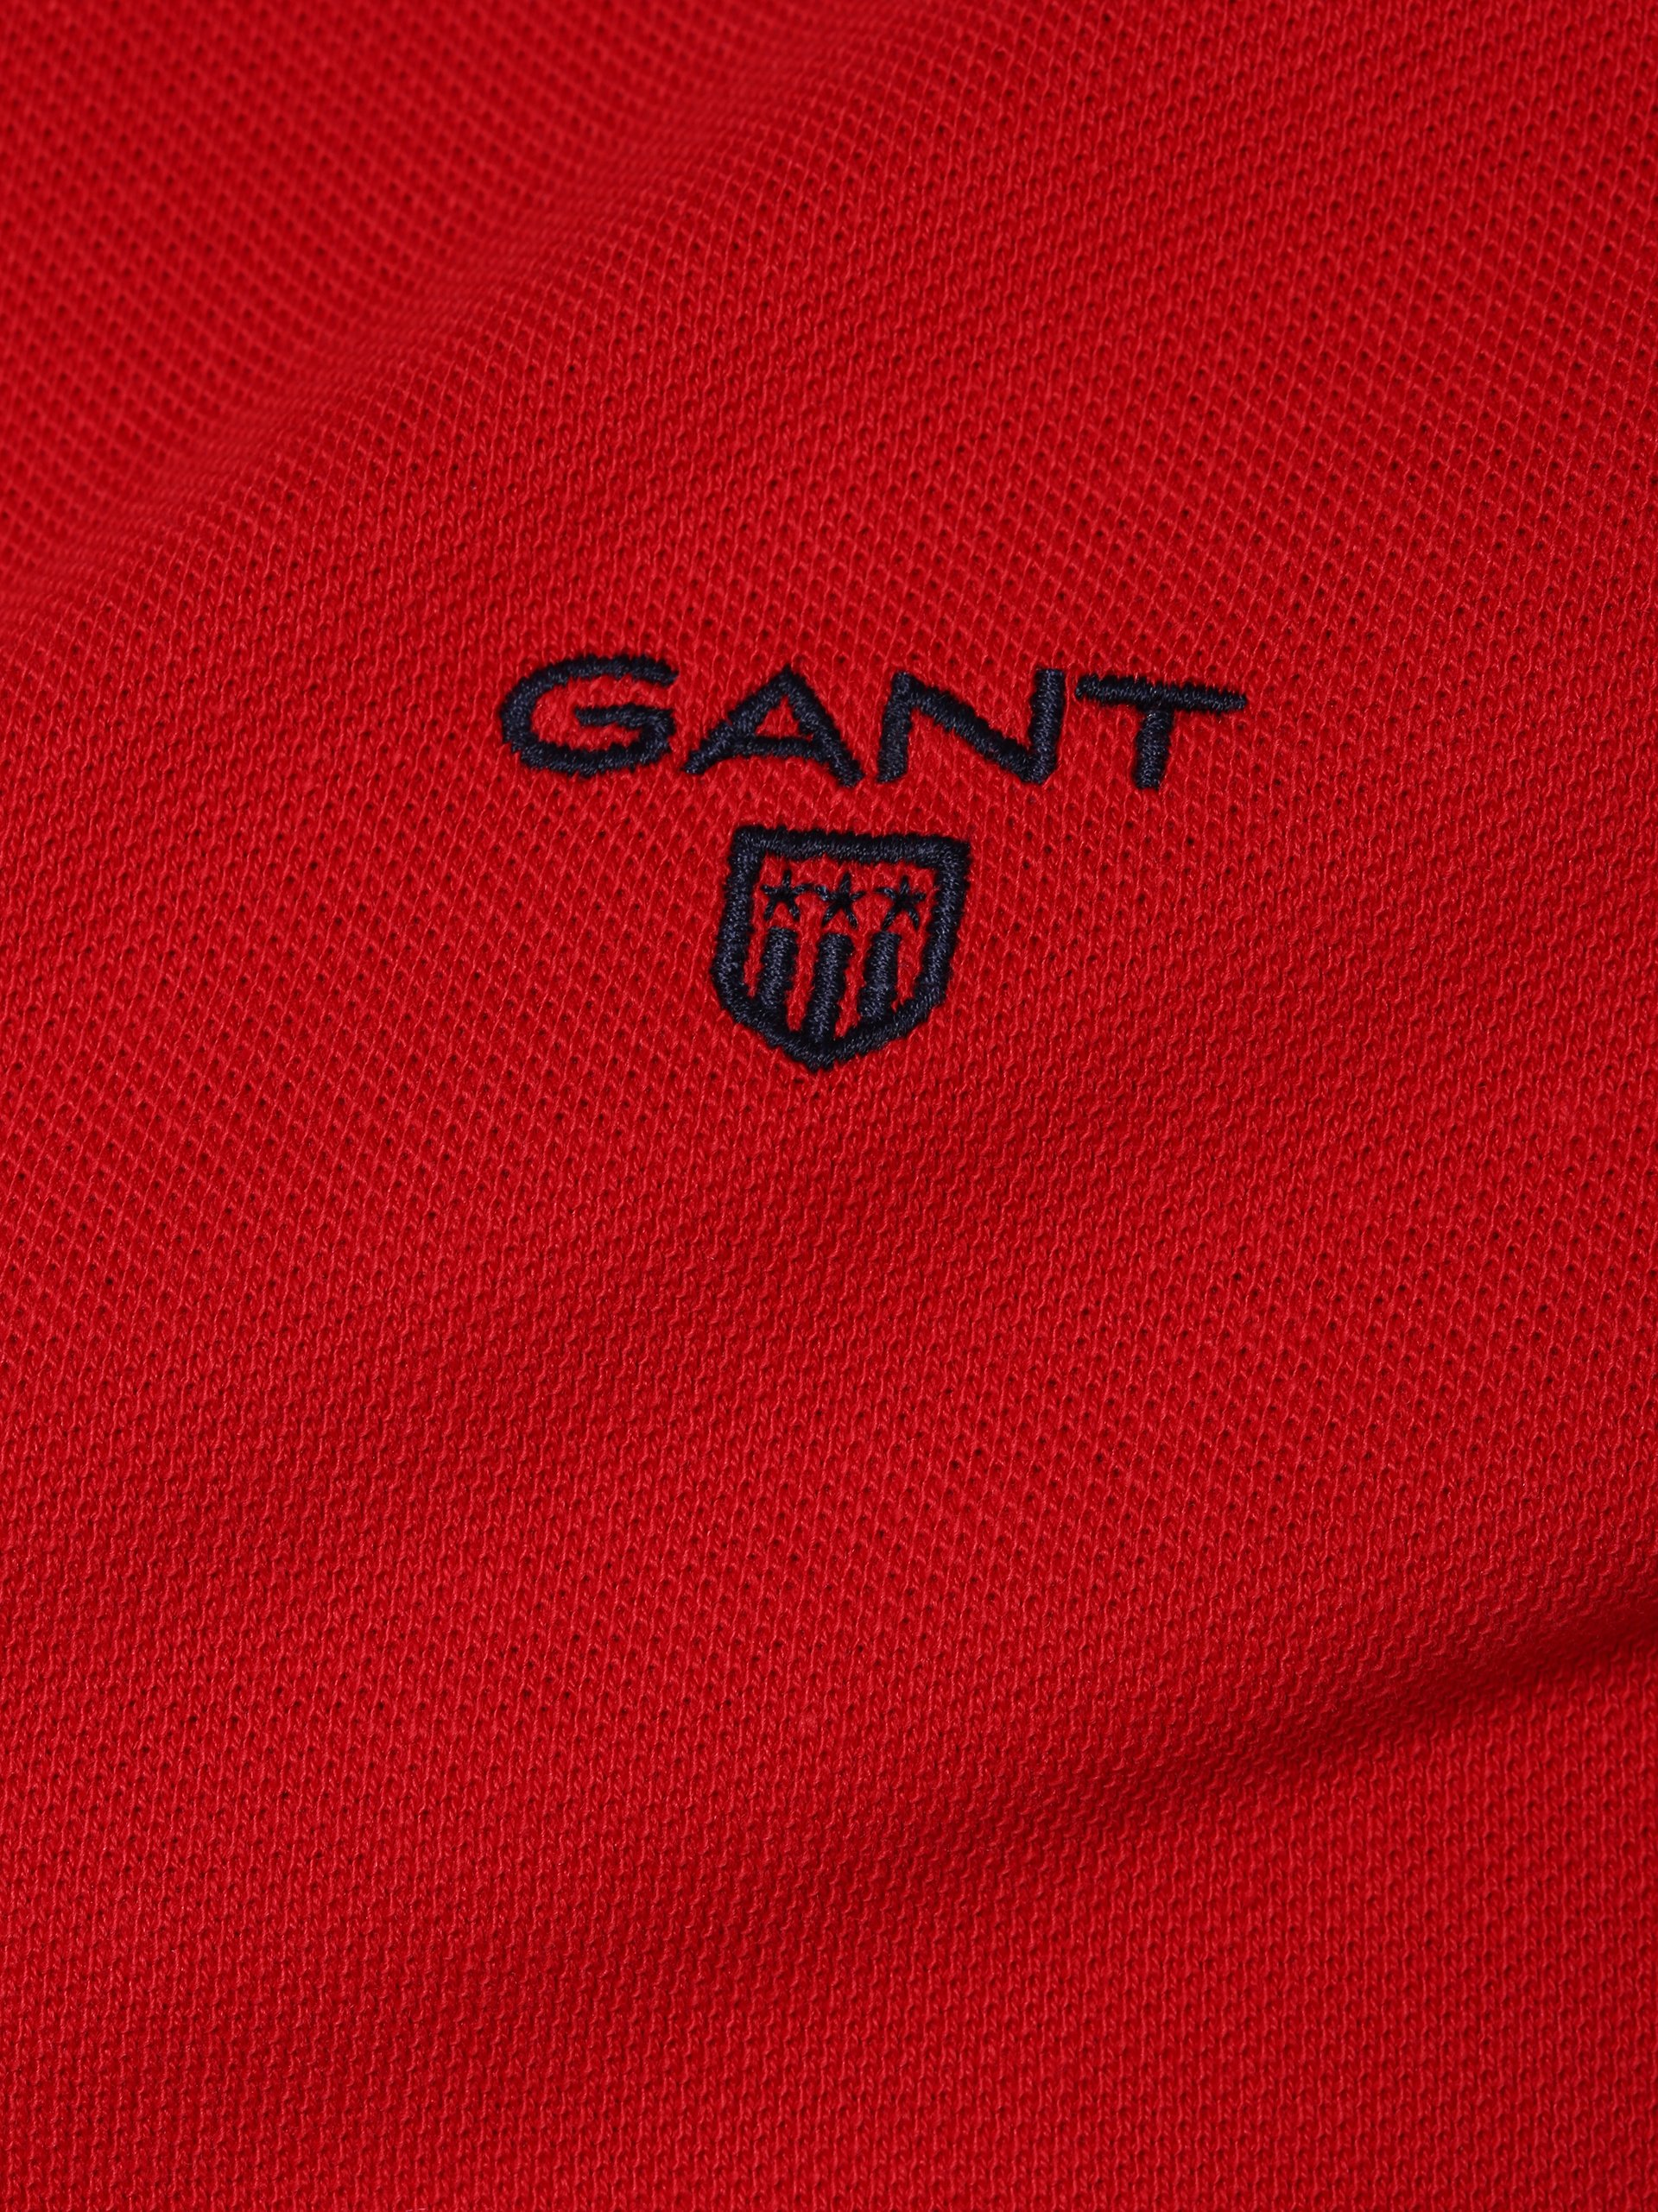 Gant Męska koszulka polo